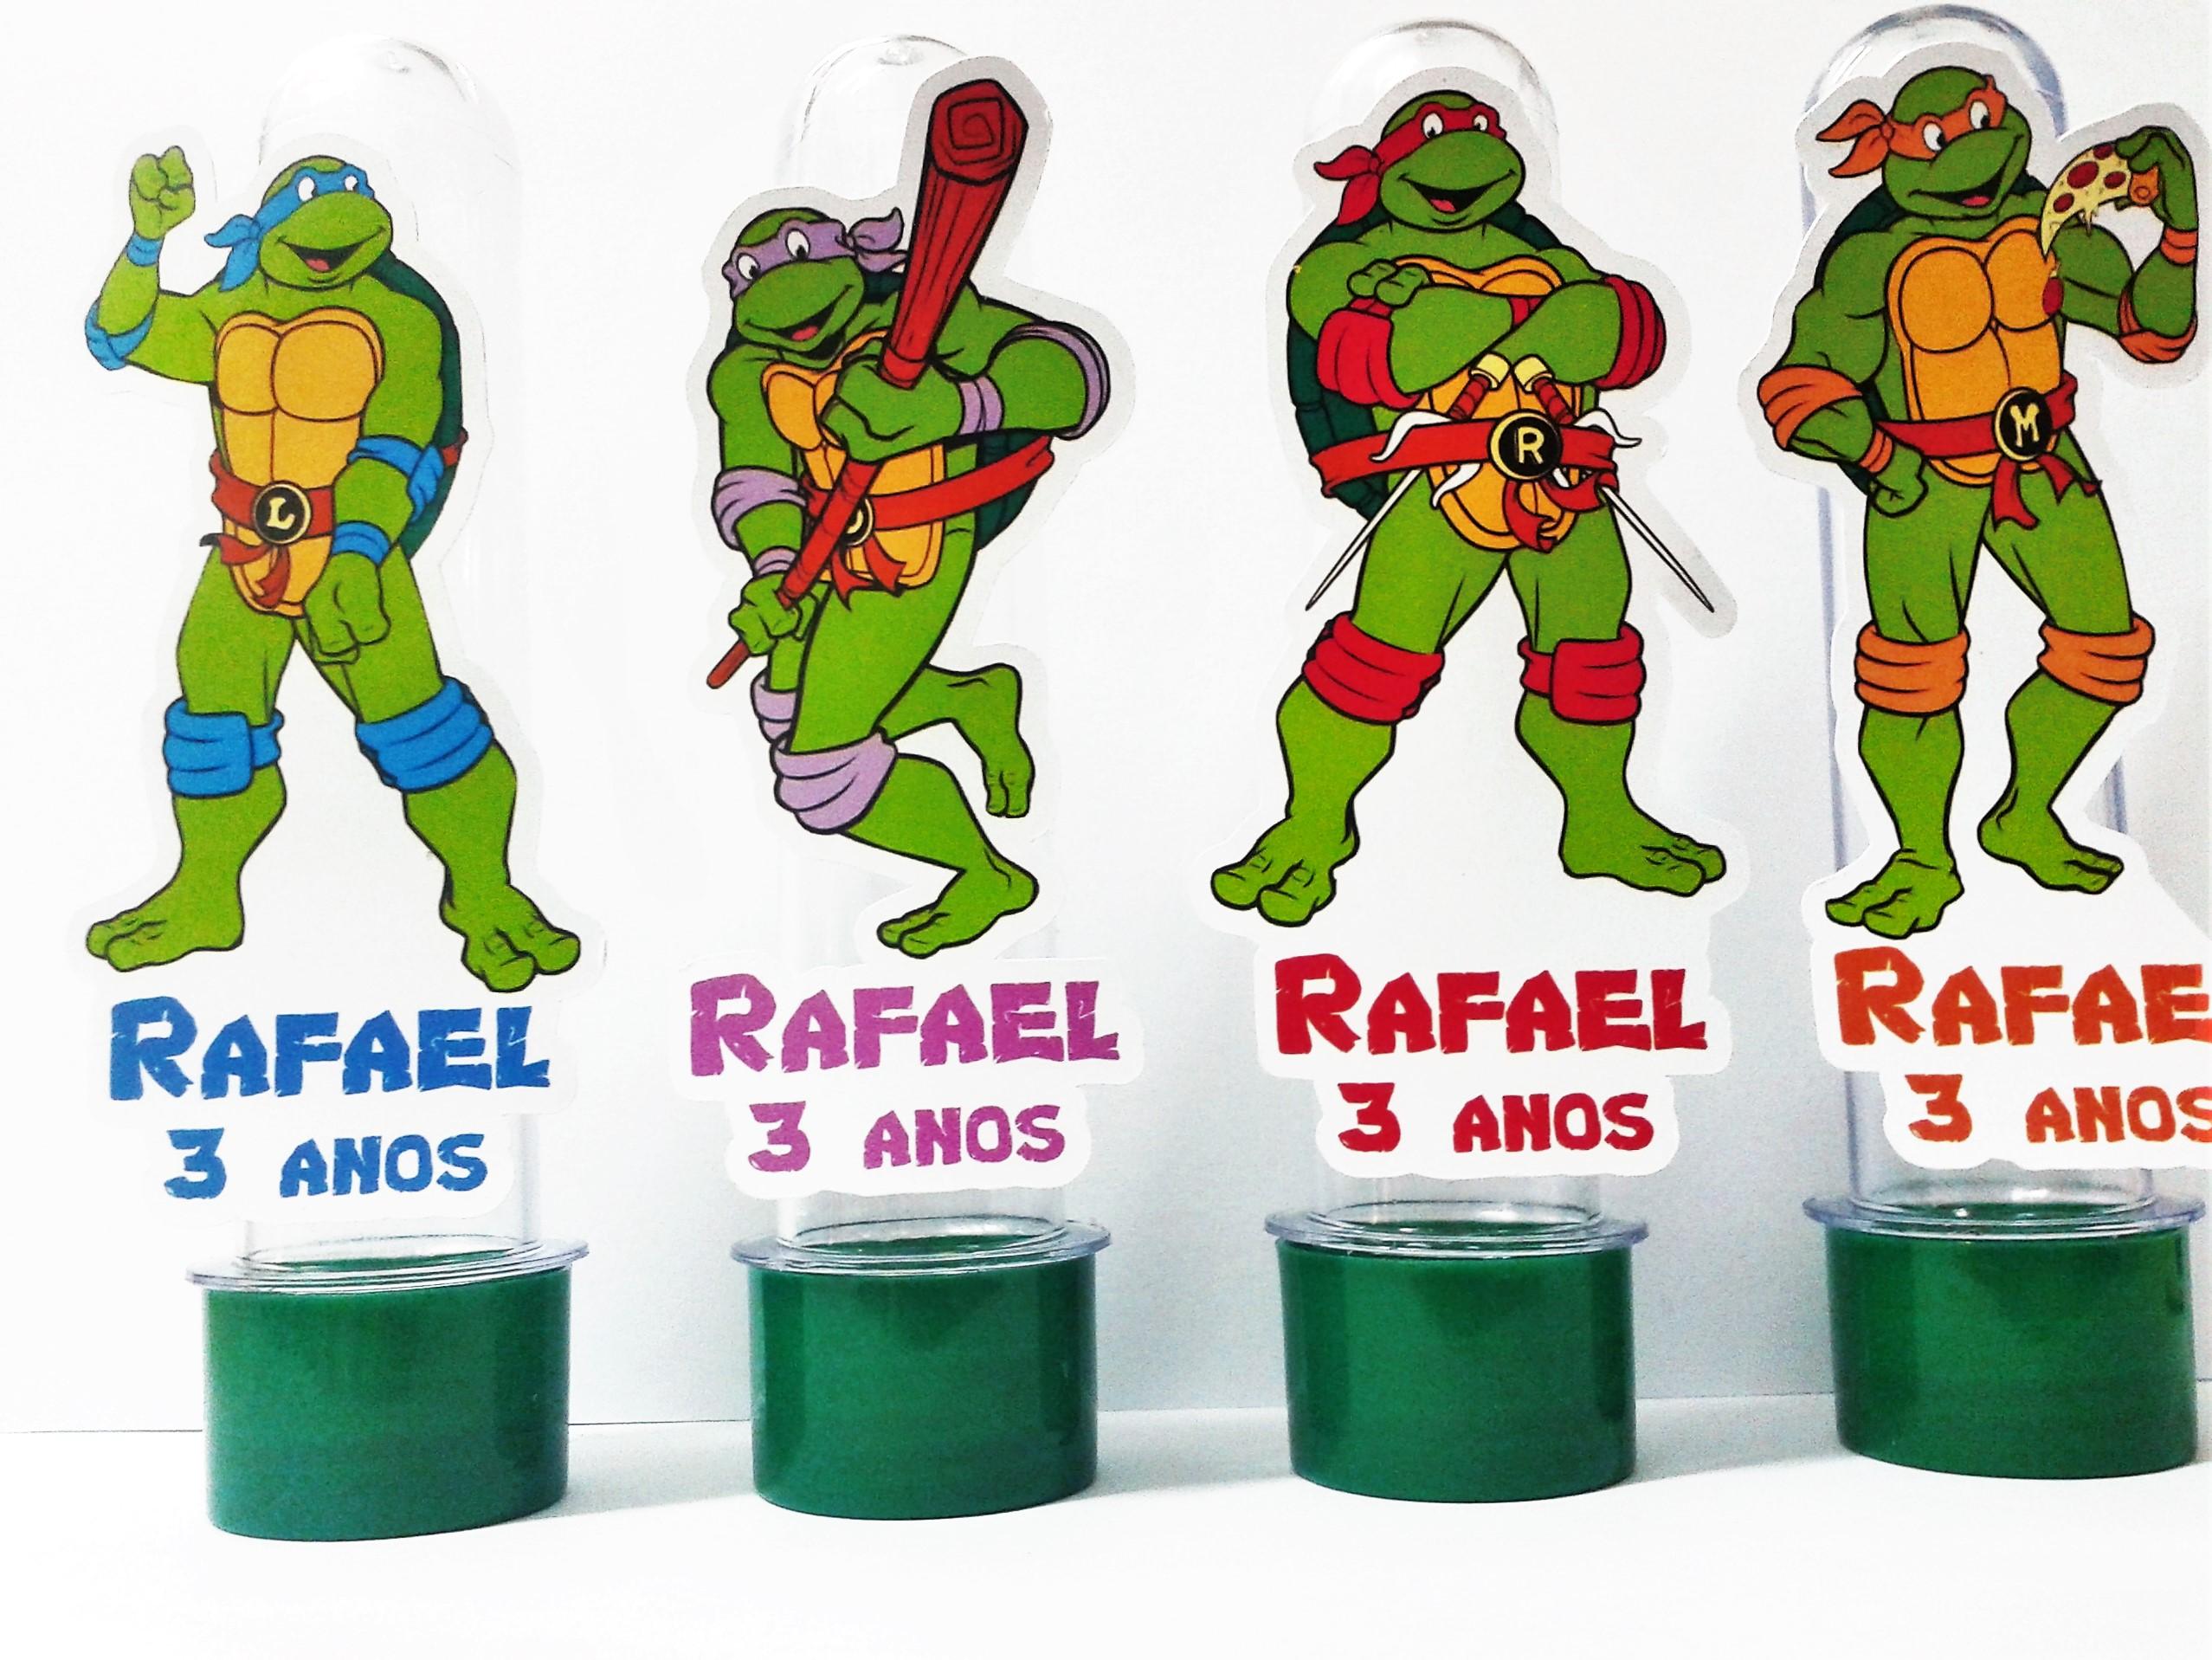 Aplique para tubete tartarugas ninjas no elo7 vilex art 5cf1c6 thecheapjerseys Image collections